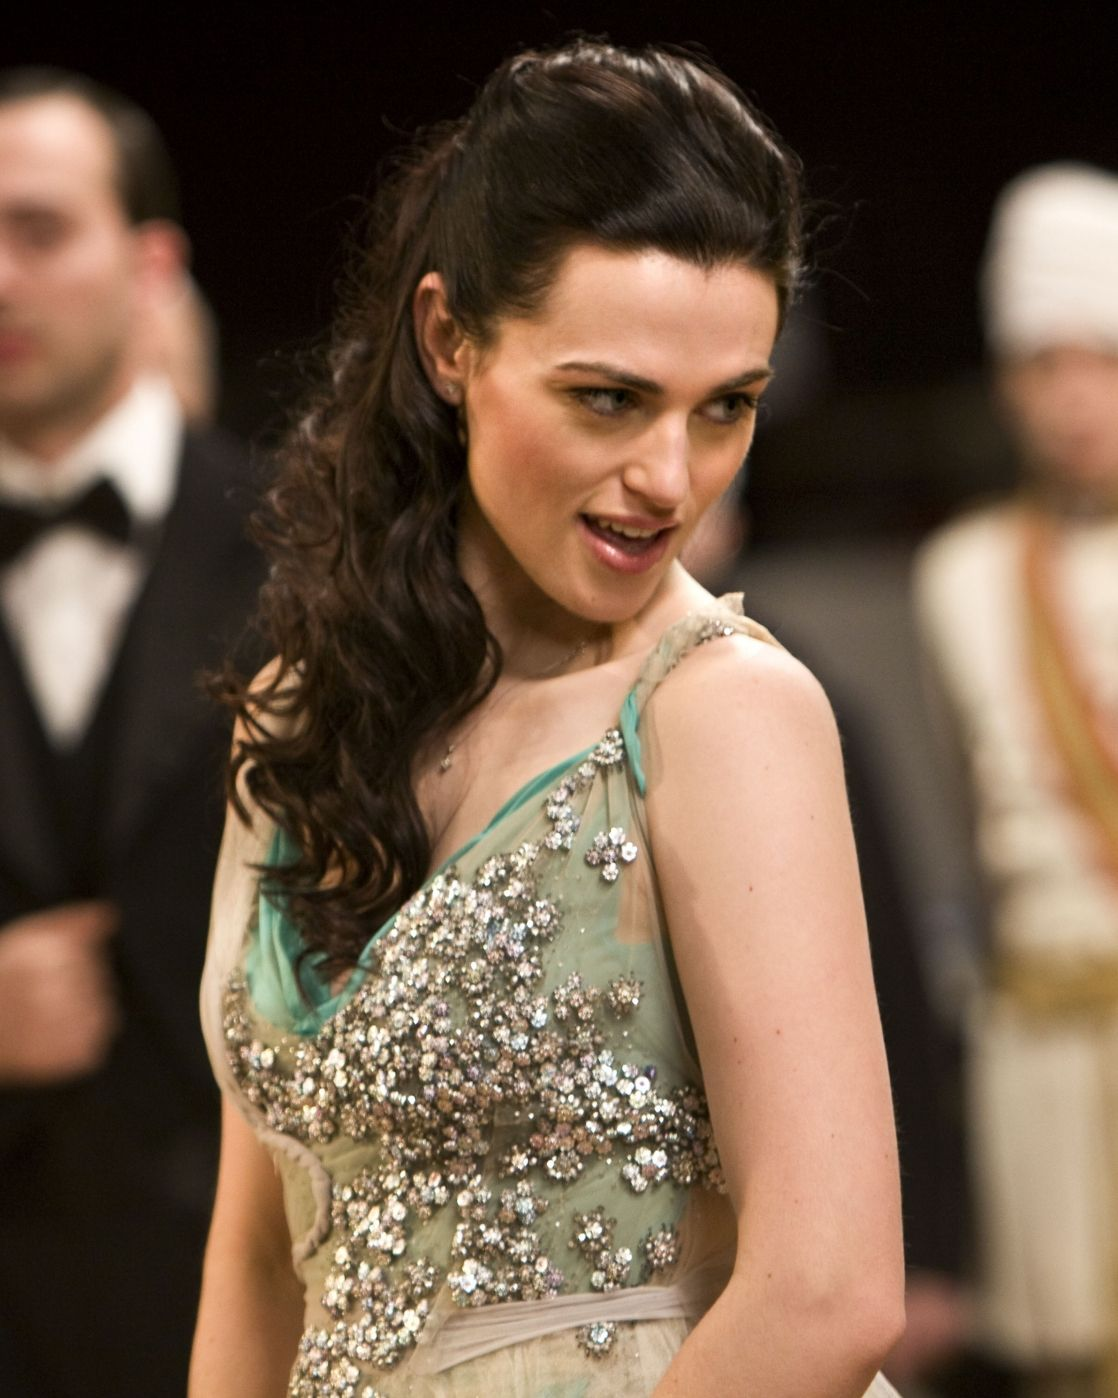 Katie McGrath - A Princess For Christmas (2011) | Sorceress costume ...